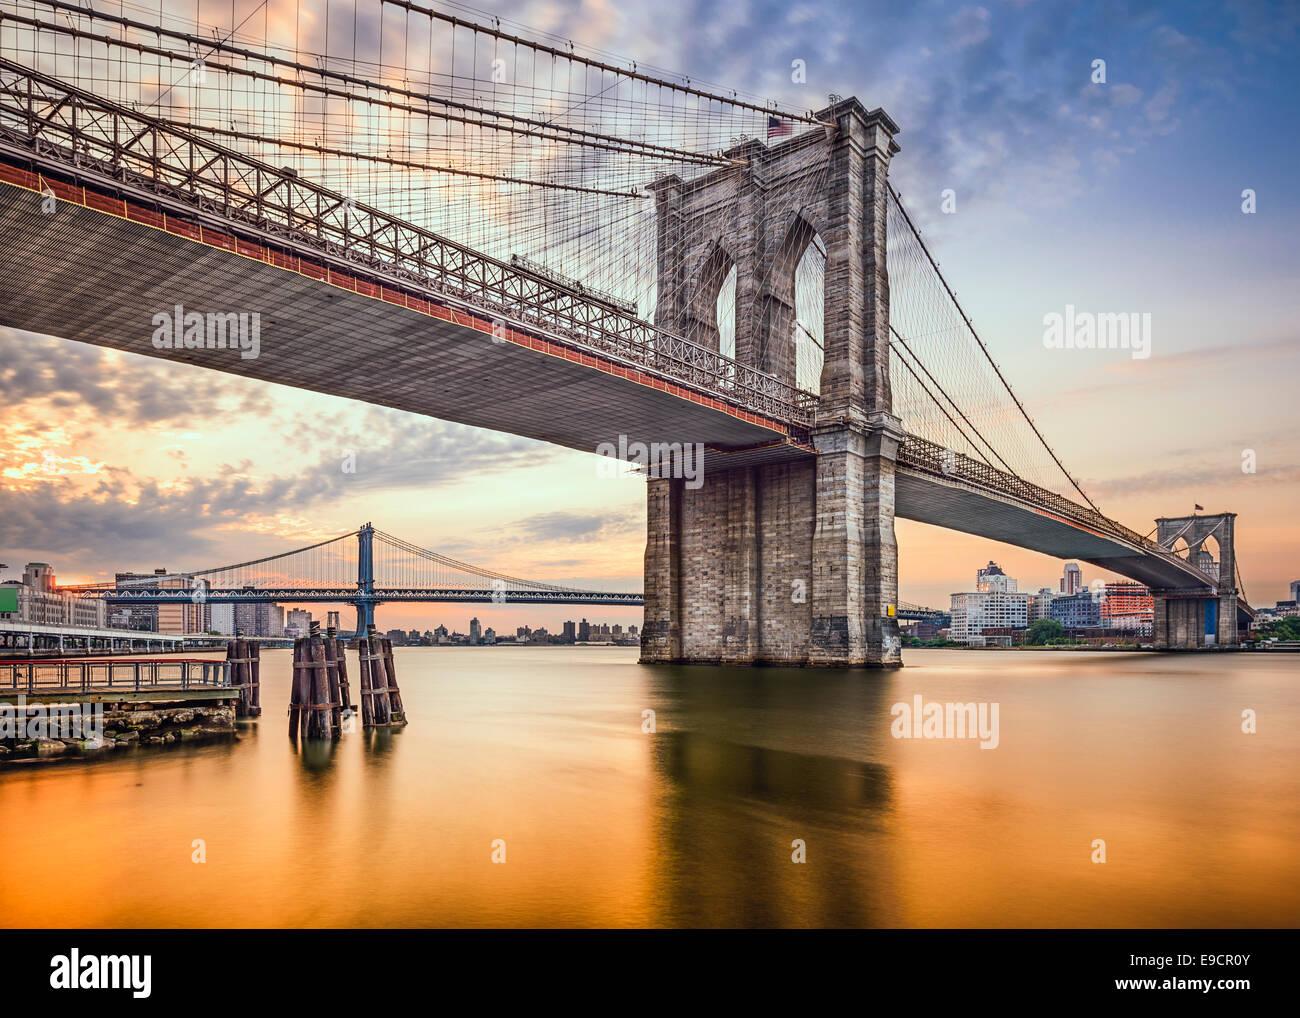 Pont de Brooklyn à New York City, USA, à l'aube. Photo Stock